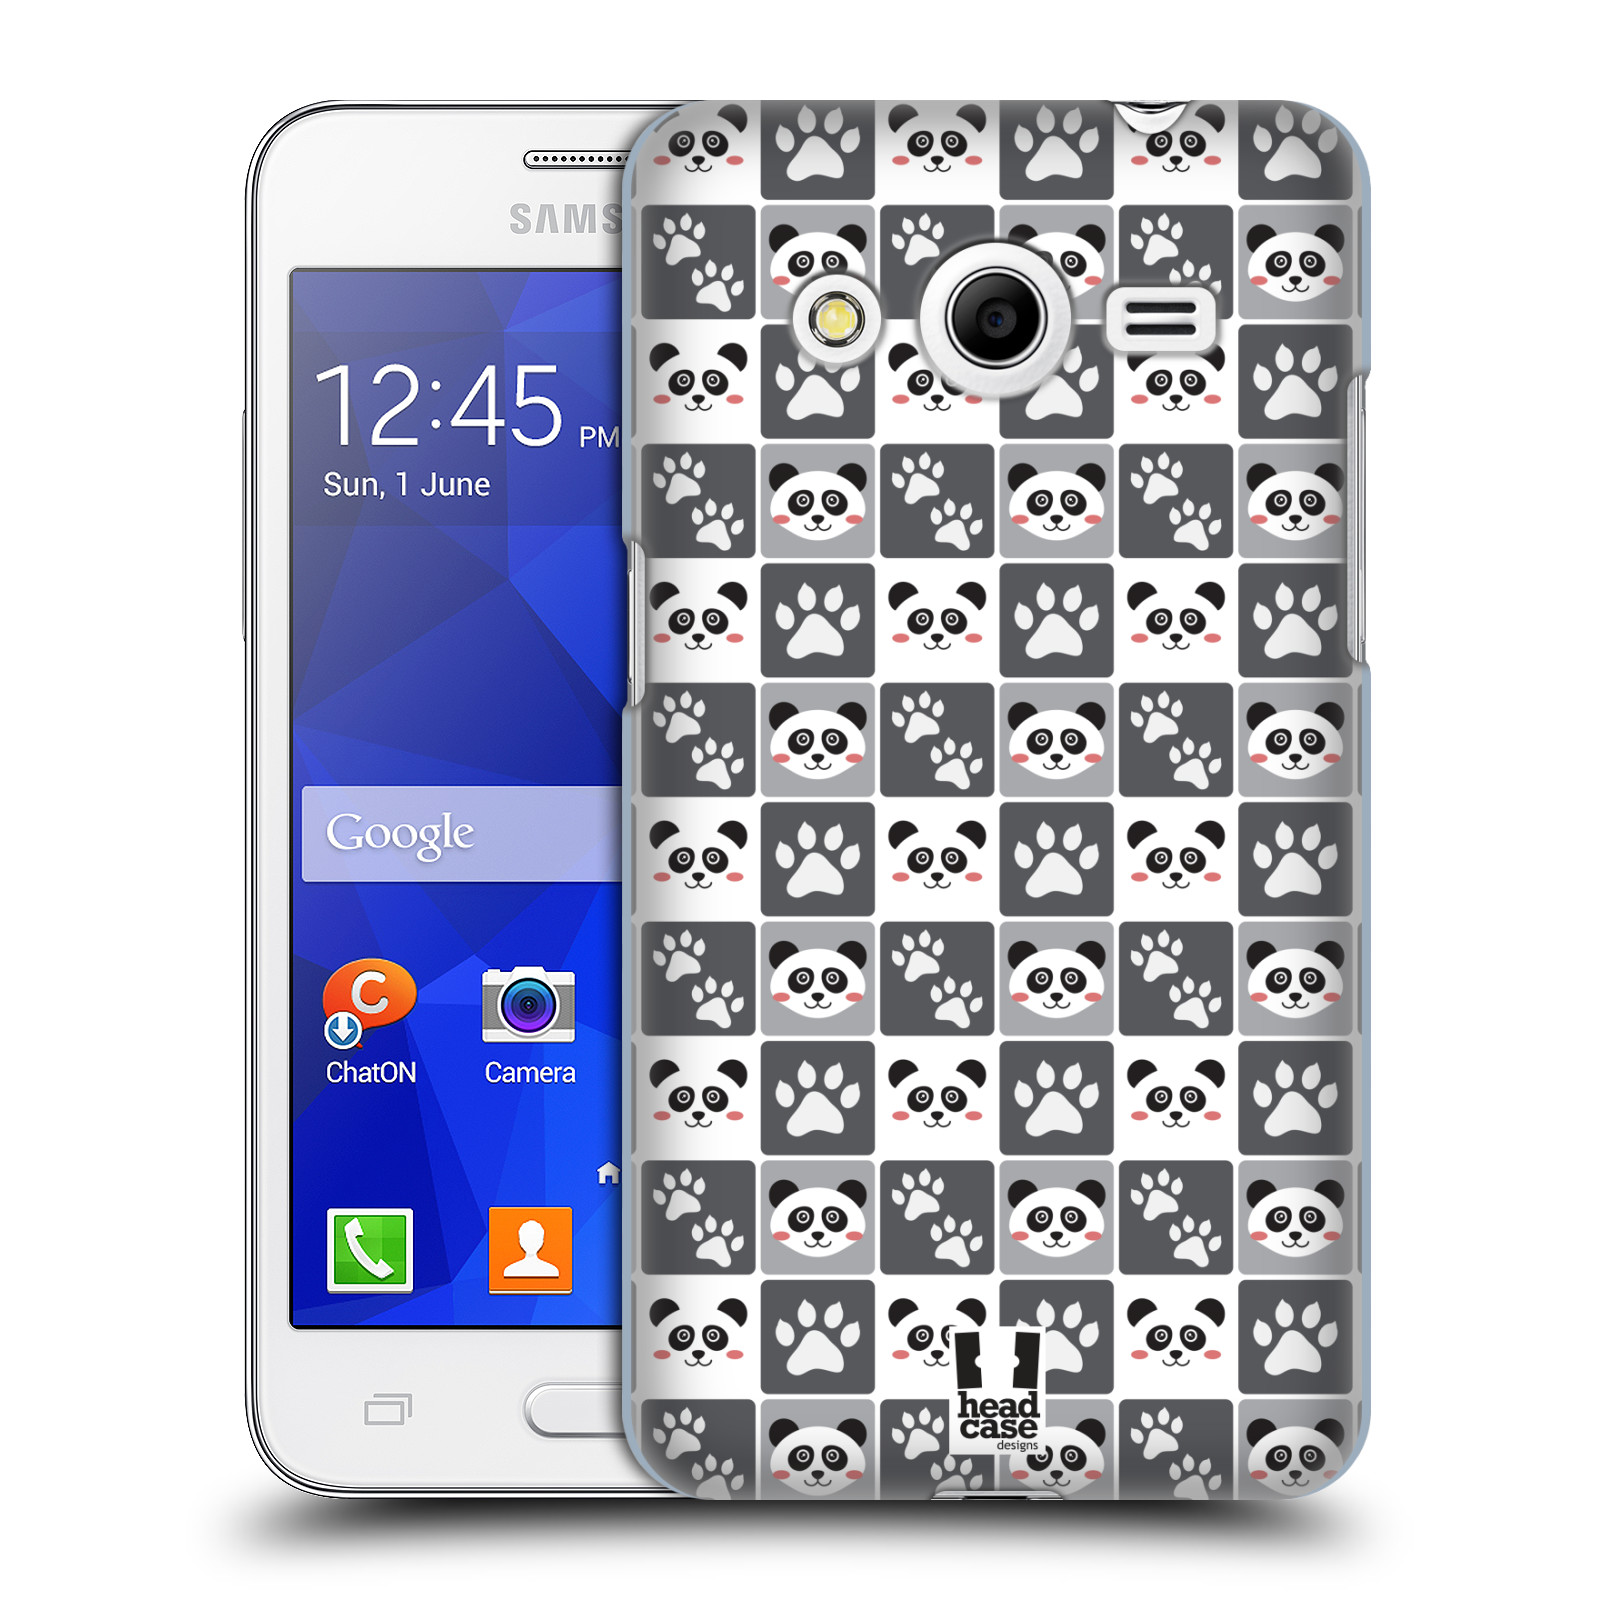 HEAD CASE plastový obal na mobil SAMSUNG GALAXY Core 2 (G355H) vzor Zvířecí razítka MEDVÍDEK PANDA